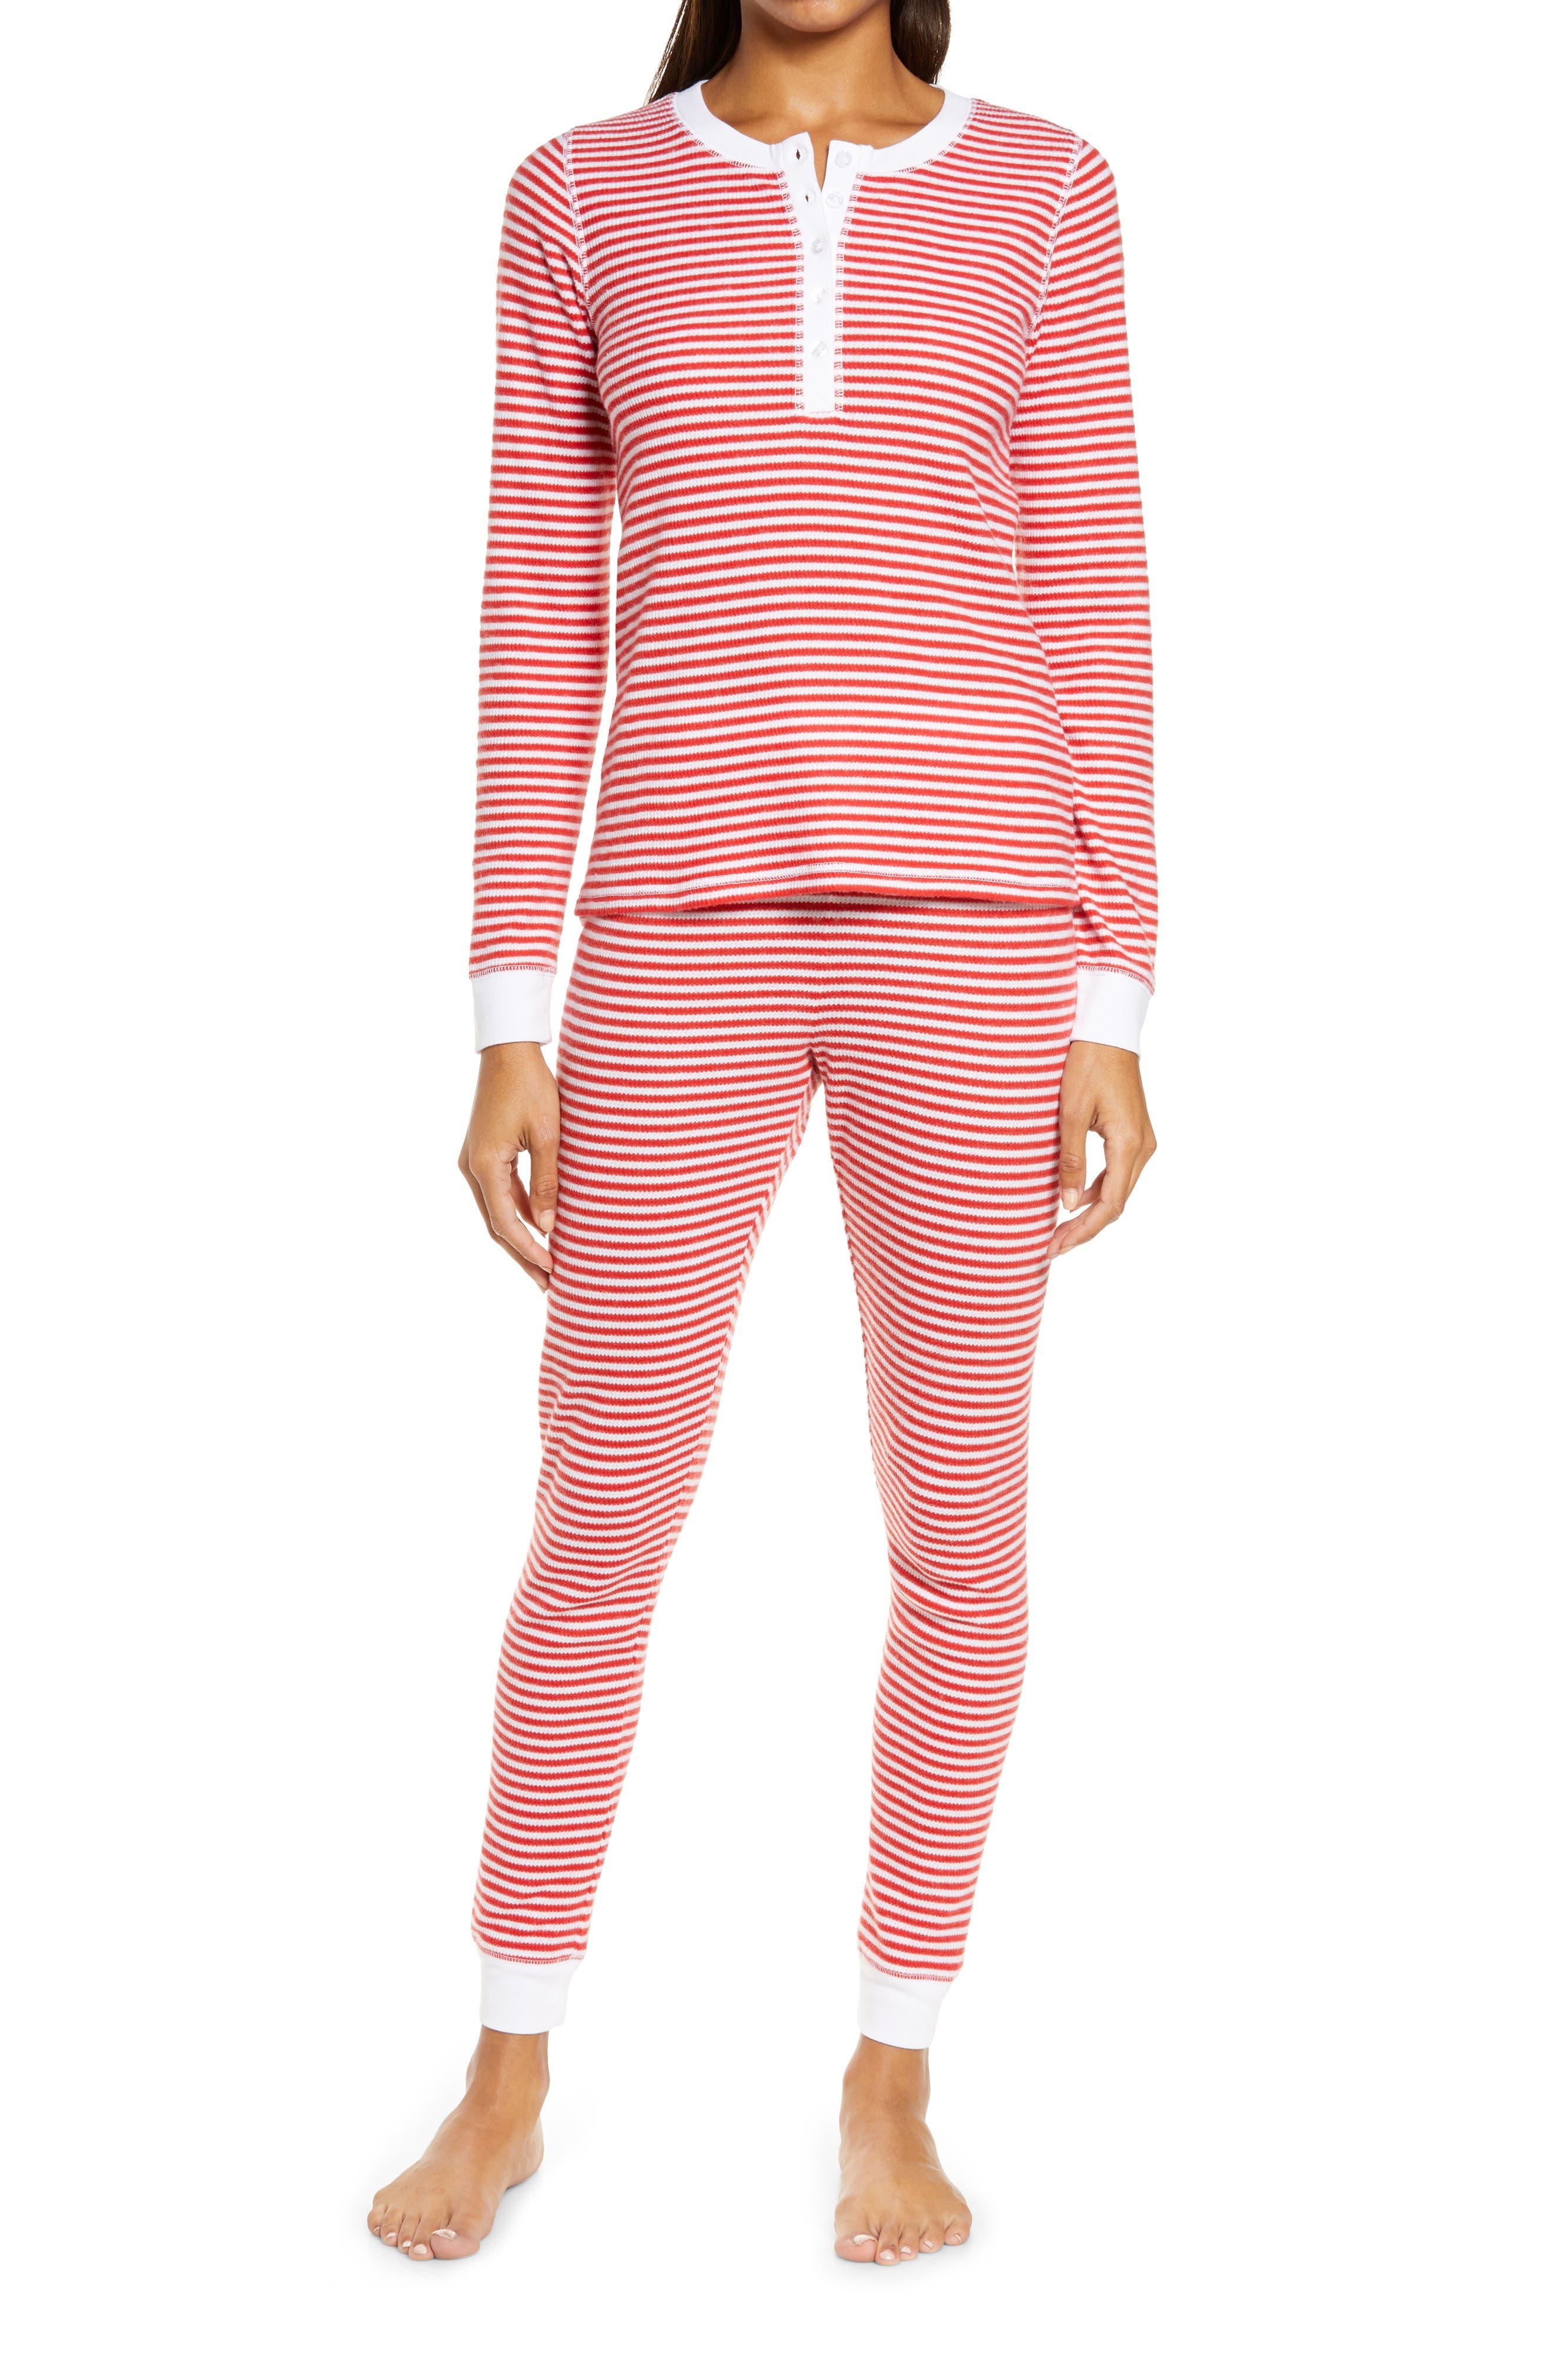 Image of Nordstrom Fam Jam Two-Piece Thermal Pajamas